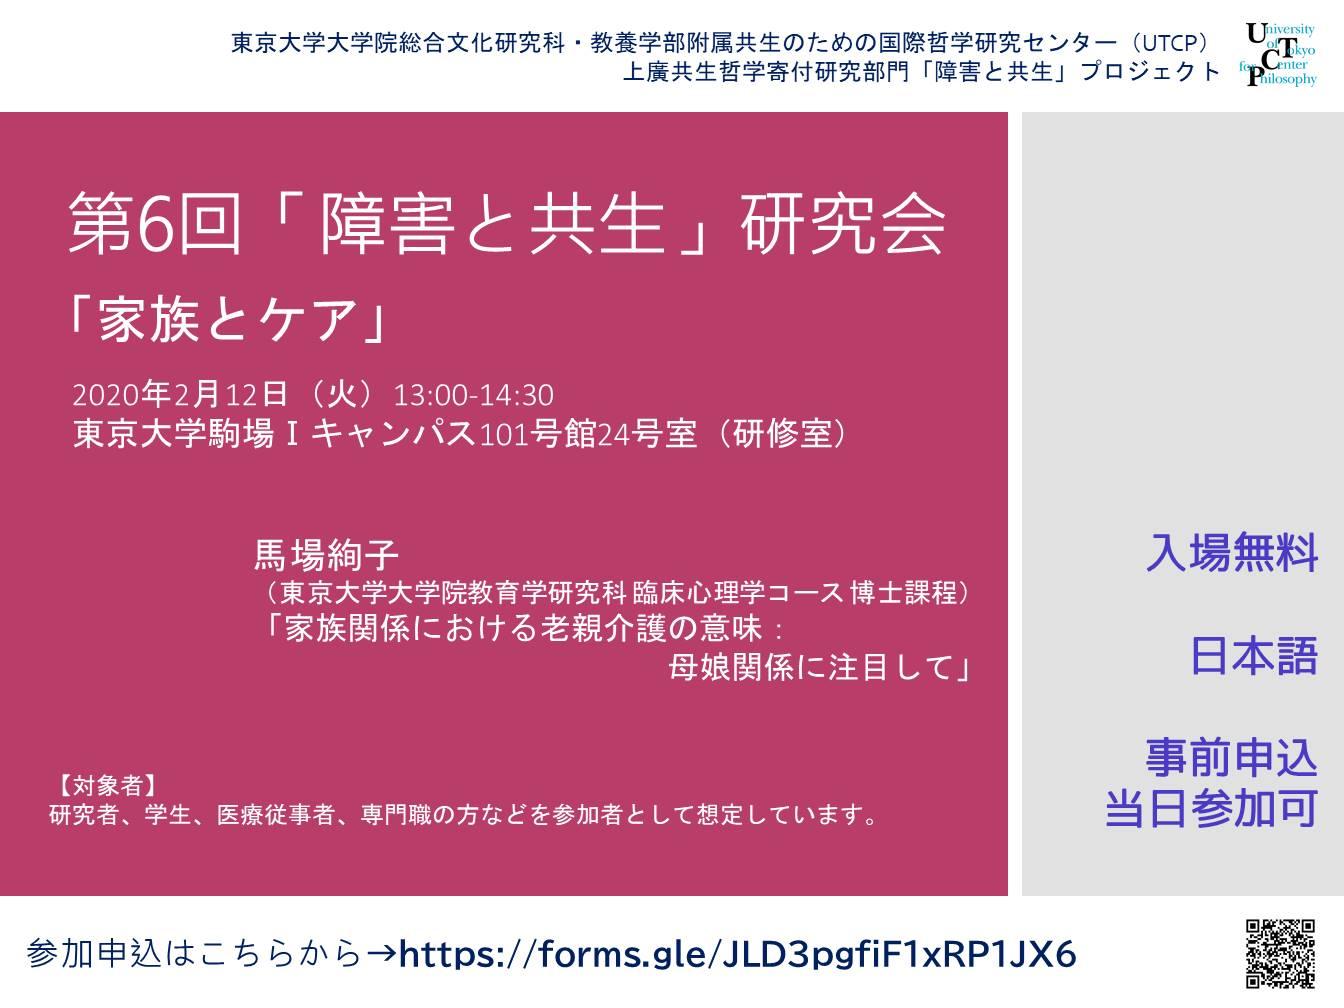 20200213_disabilityandcoexistence_poster.jpg%EF%BC%882%EF%BC%89.jpg